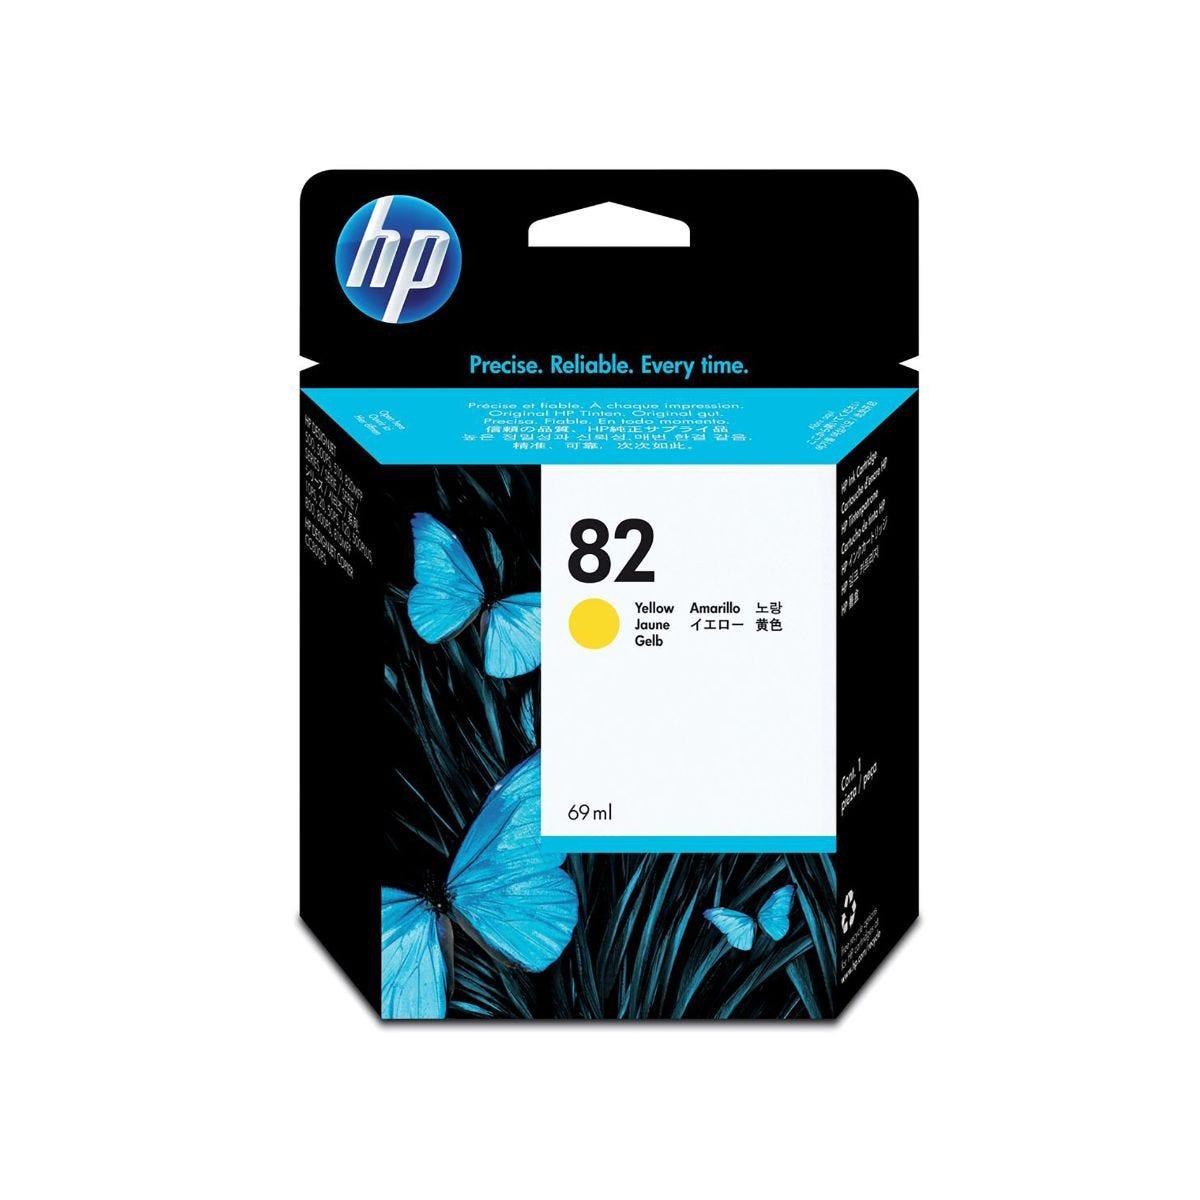 HP 82 Dye Inkjet Cartridge Yellow, Yellow